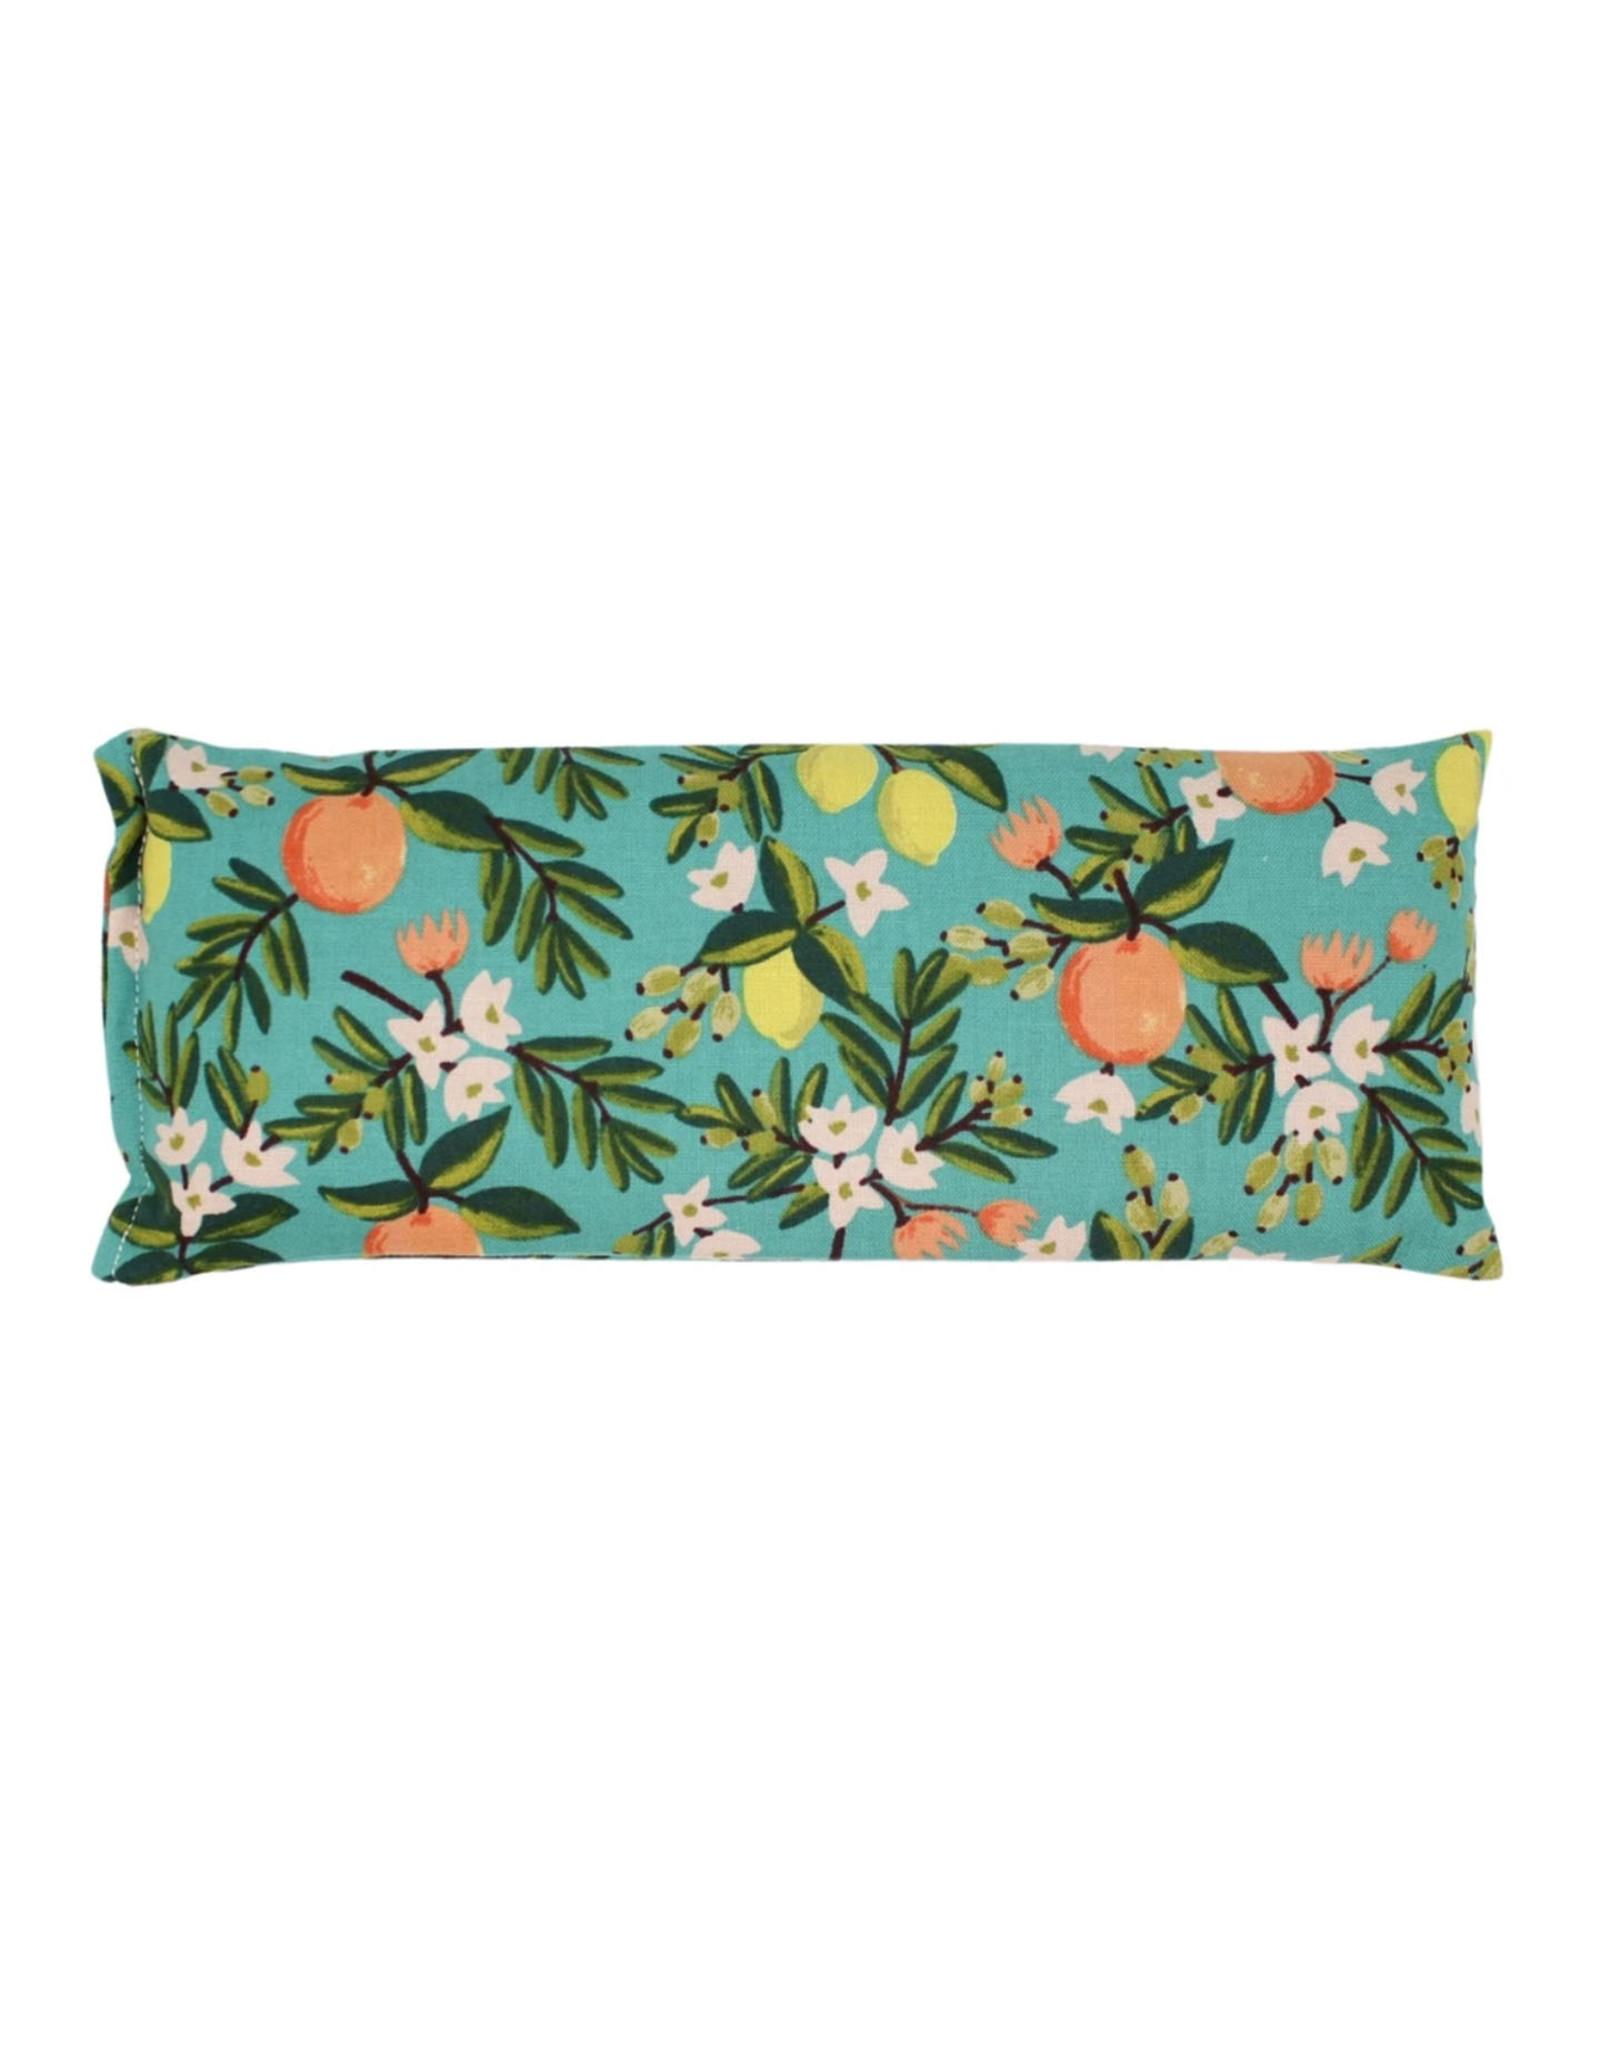 Lavender Eye Pillow :  Teal Citrus